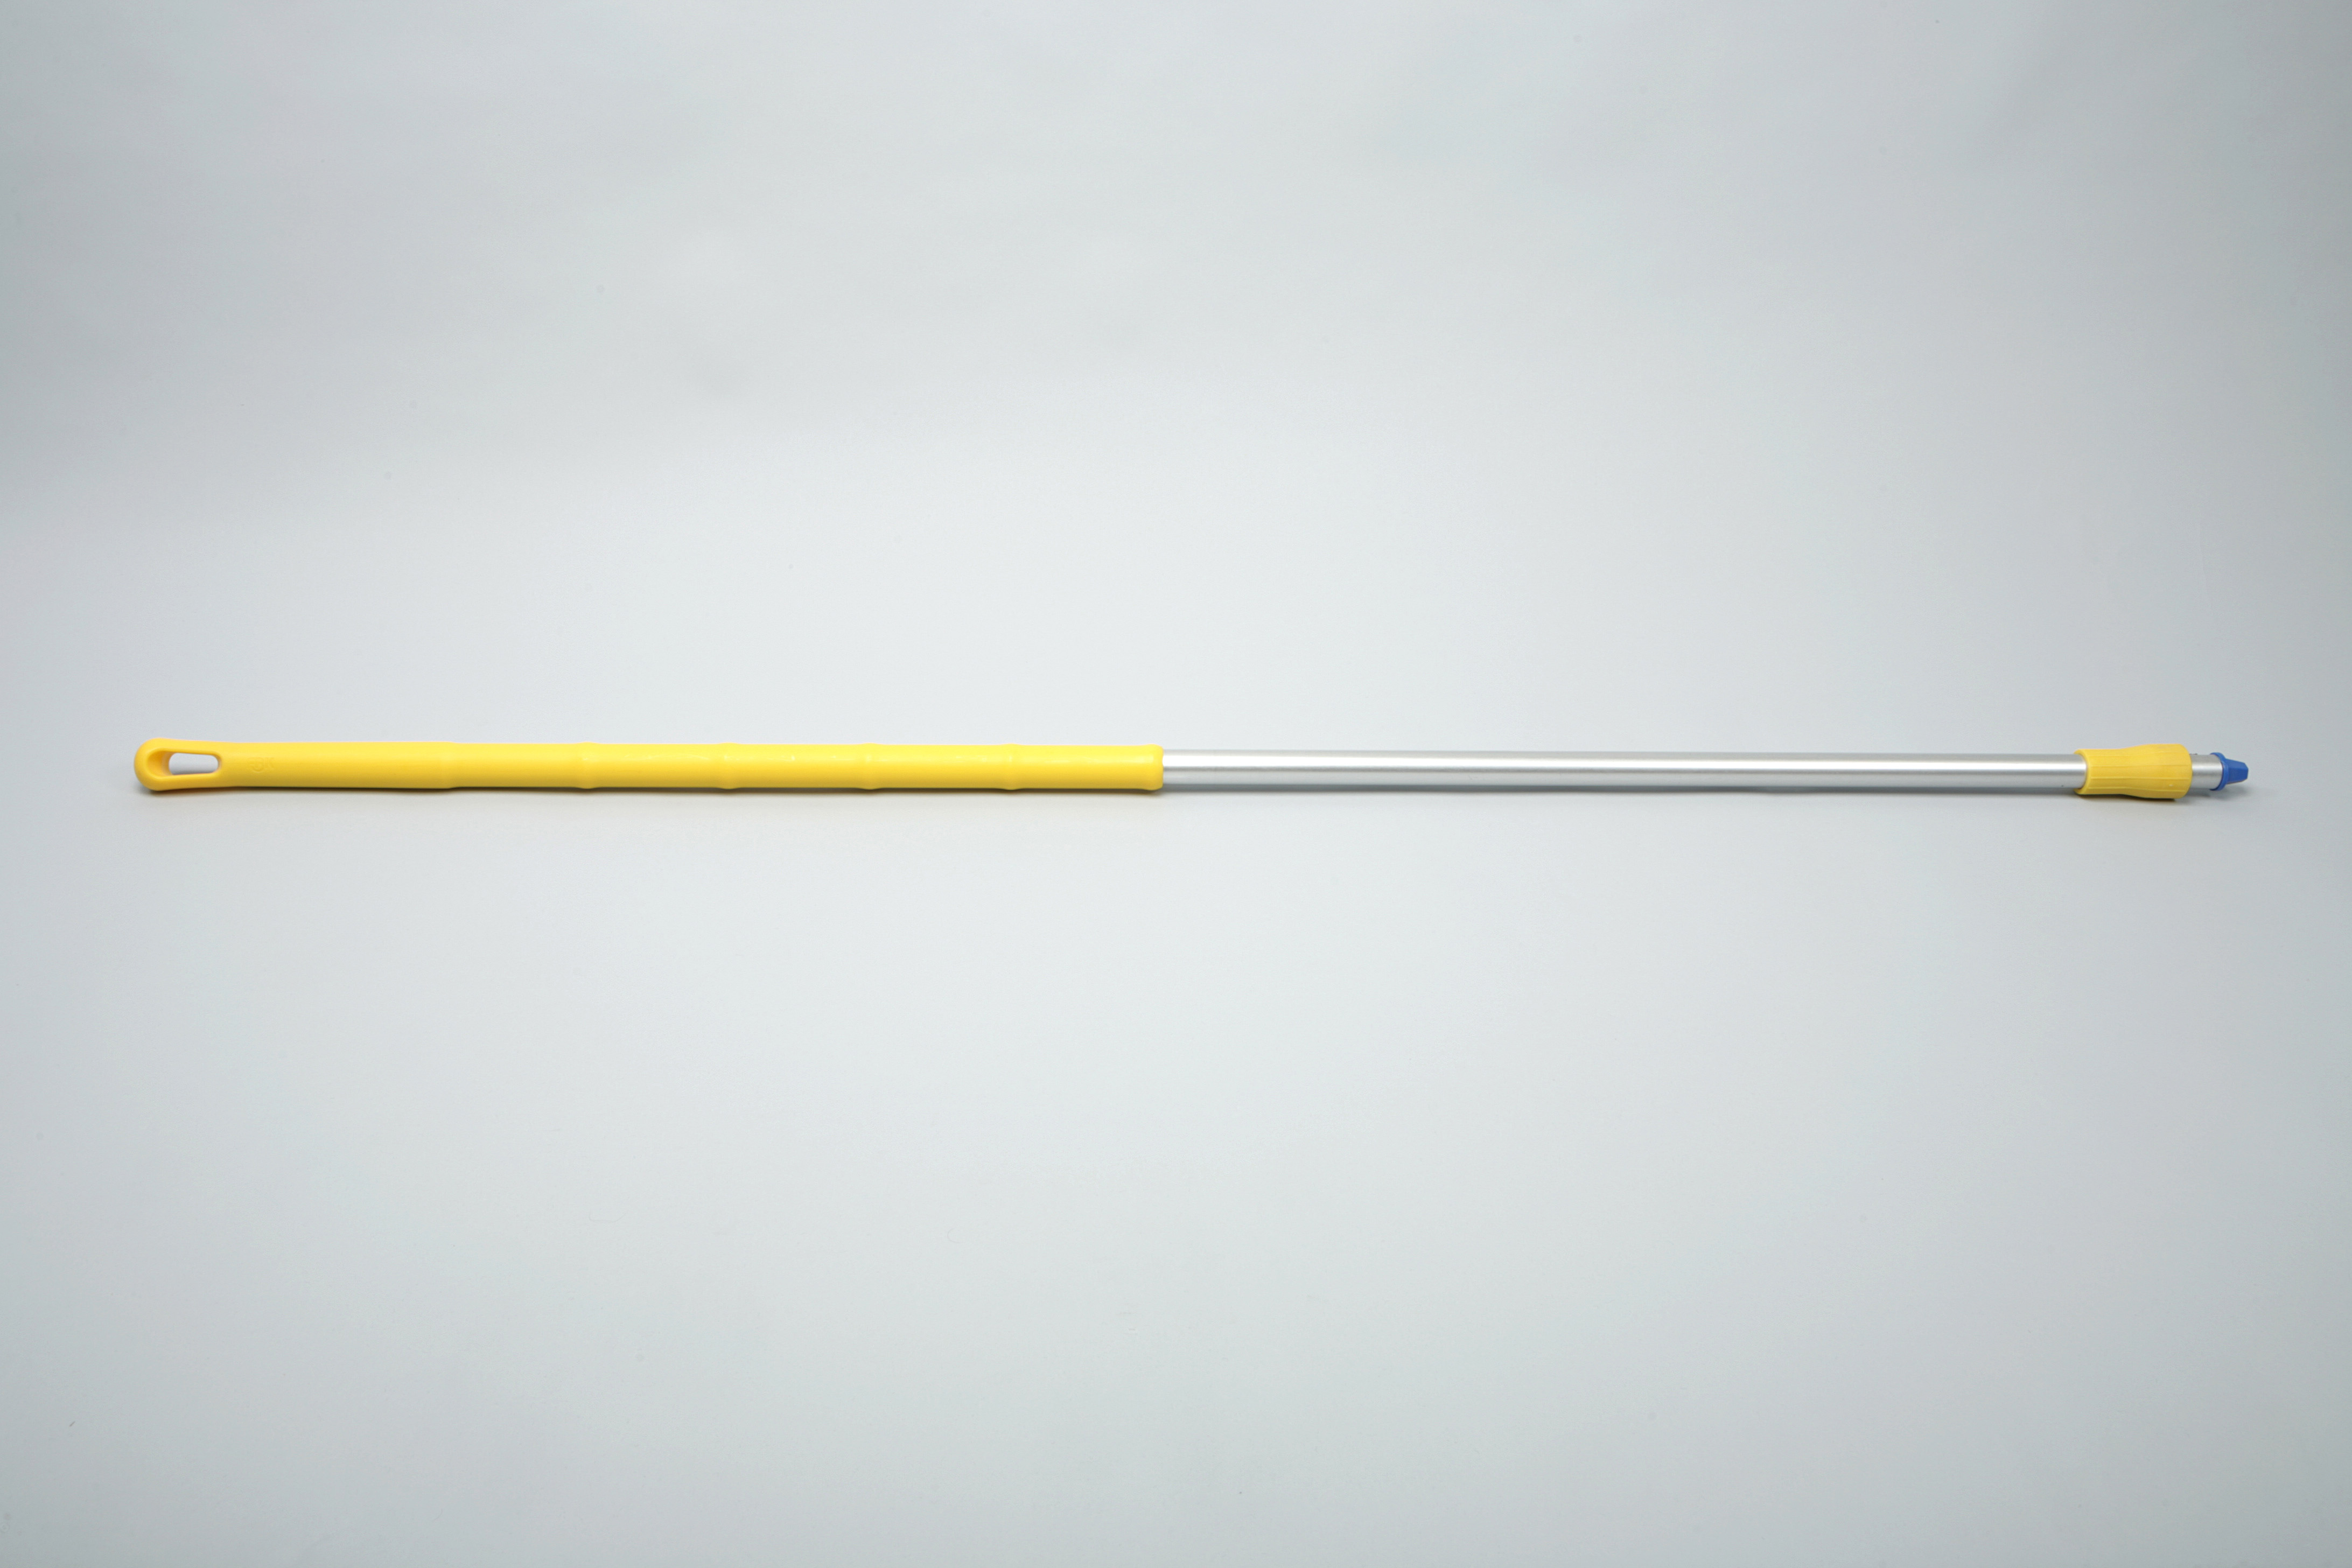 Unimop vars 150 cm, Ergo, alumiinium, kollane, kastis 6 tk